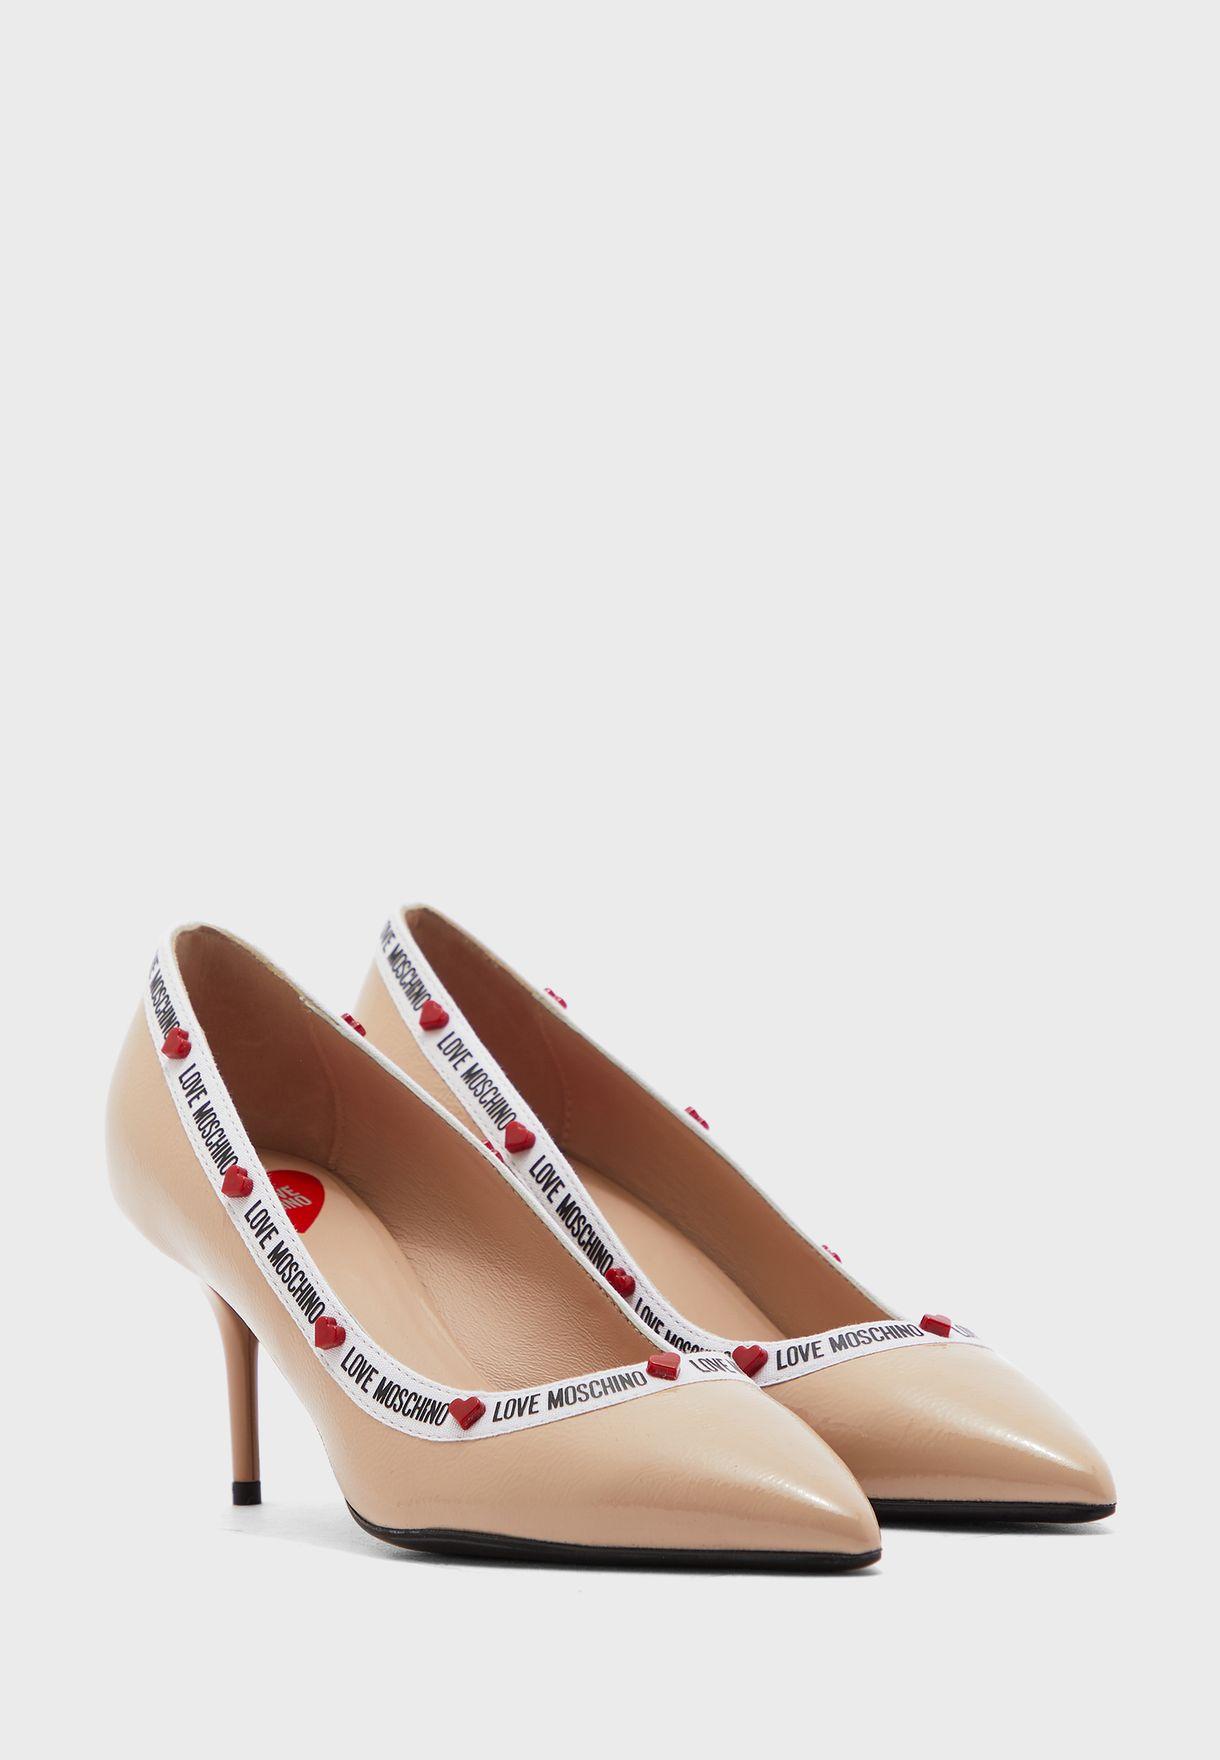 Shimmer Heel Pump - Cipria/Poudre